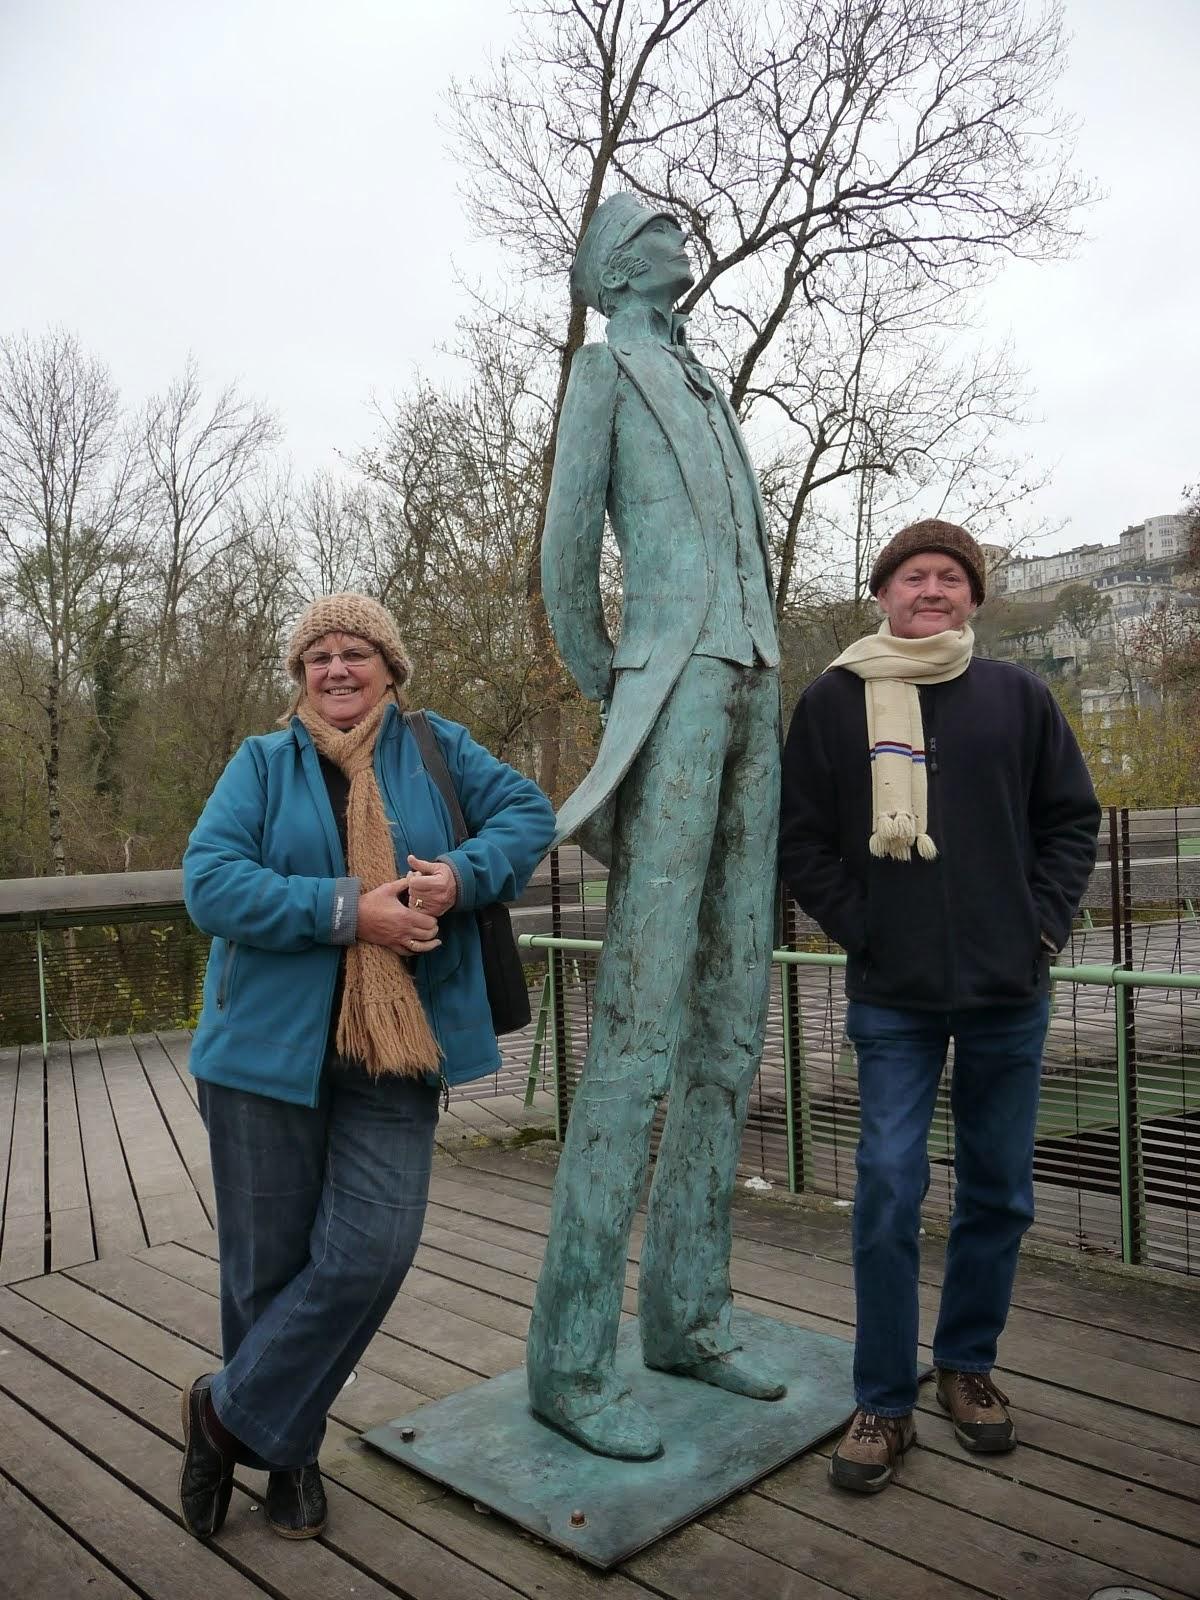 Moi et ma femme at Angouleme, Nov